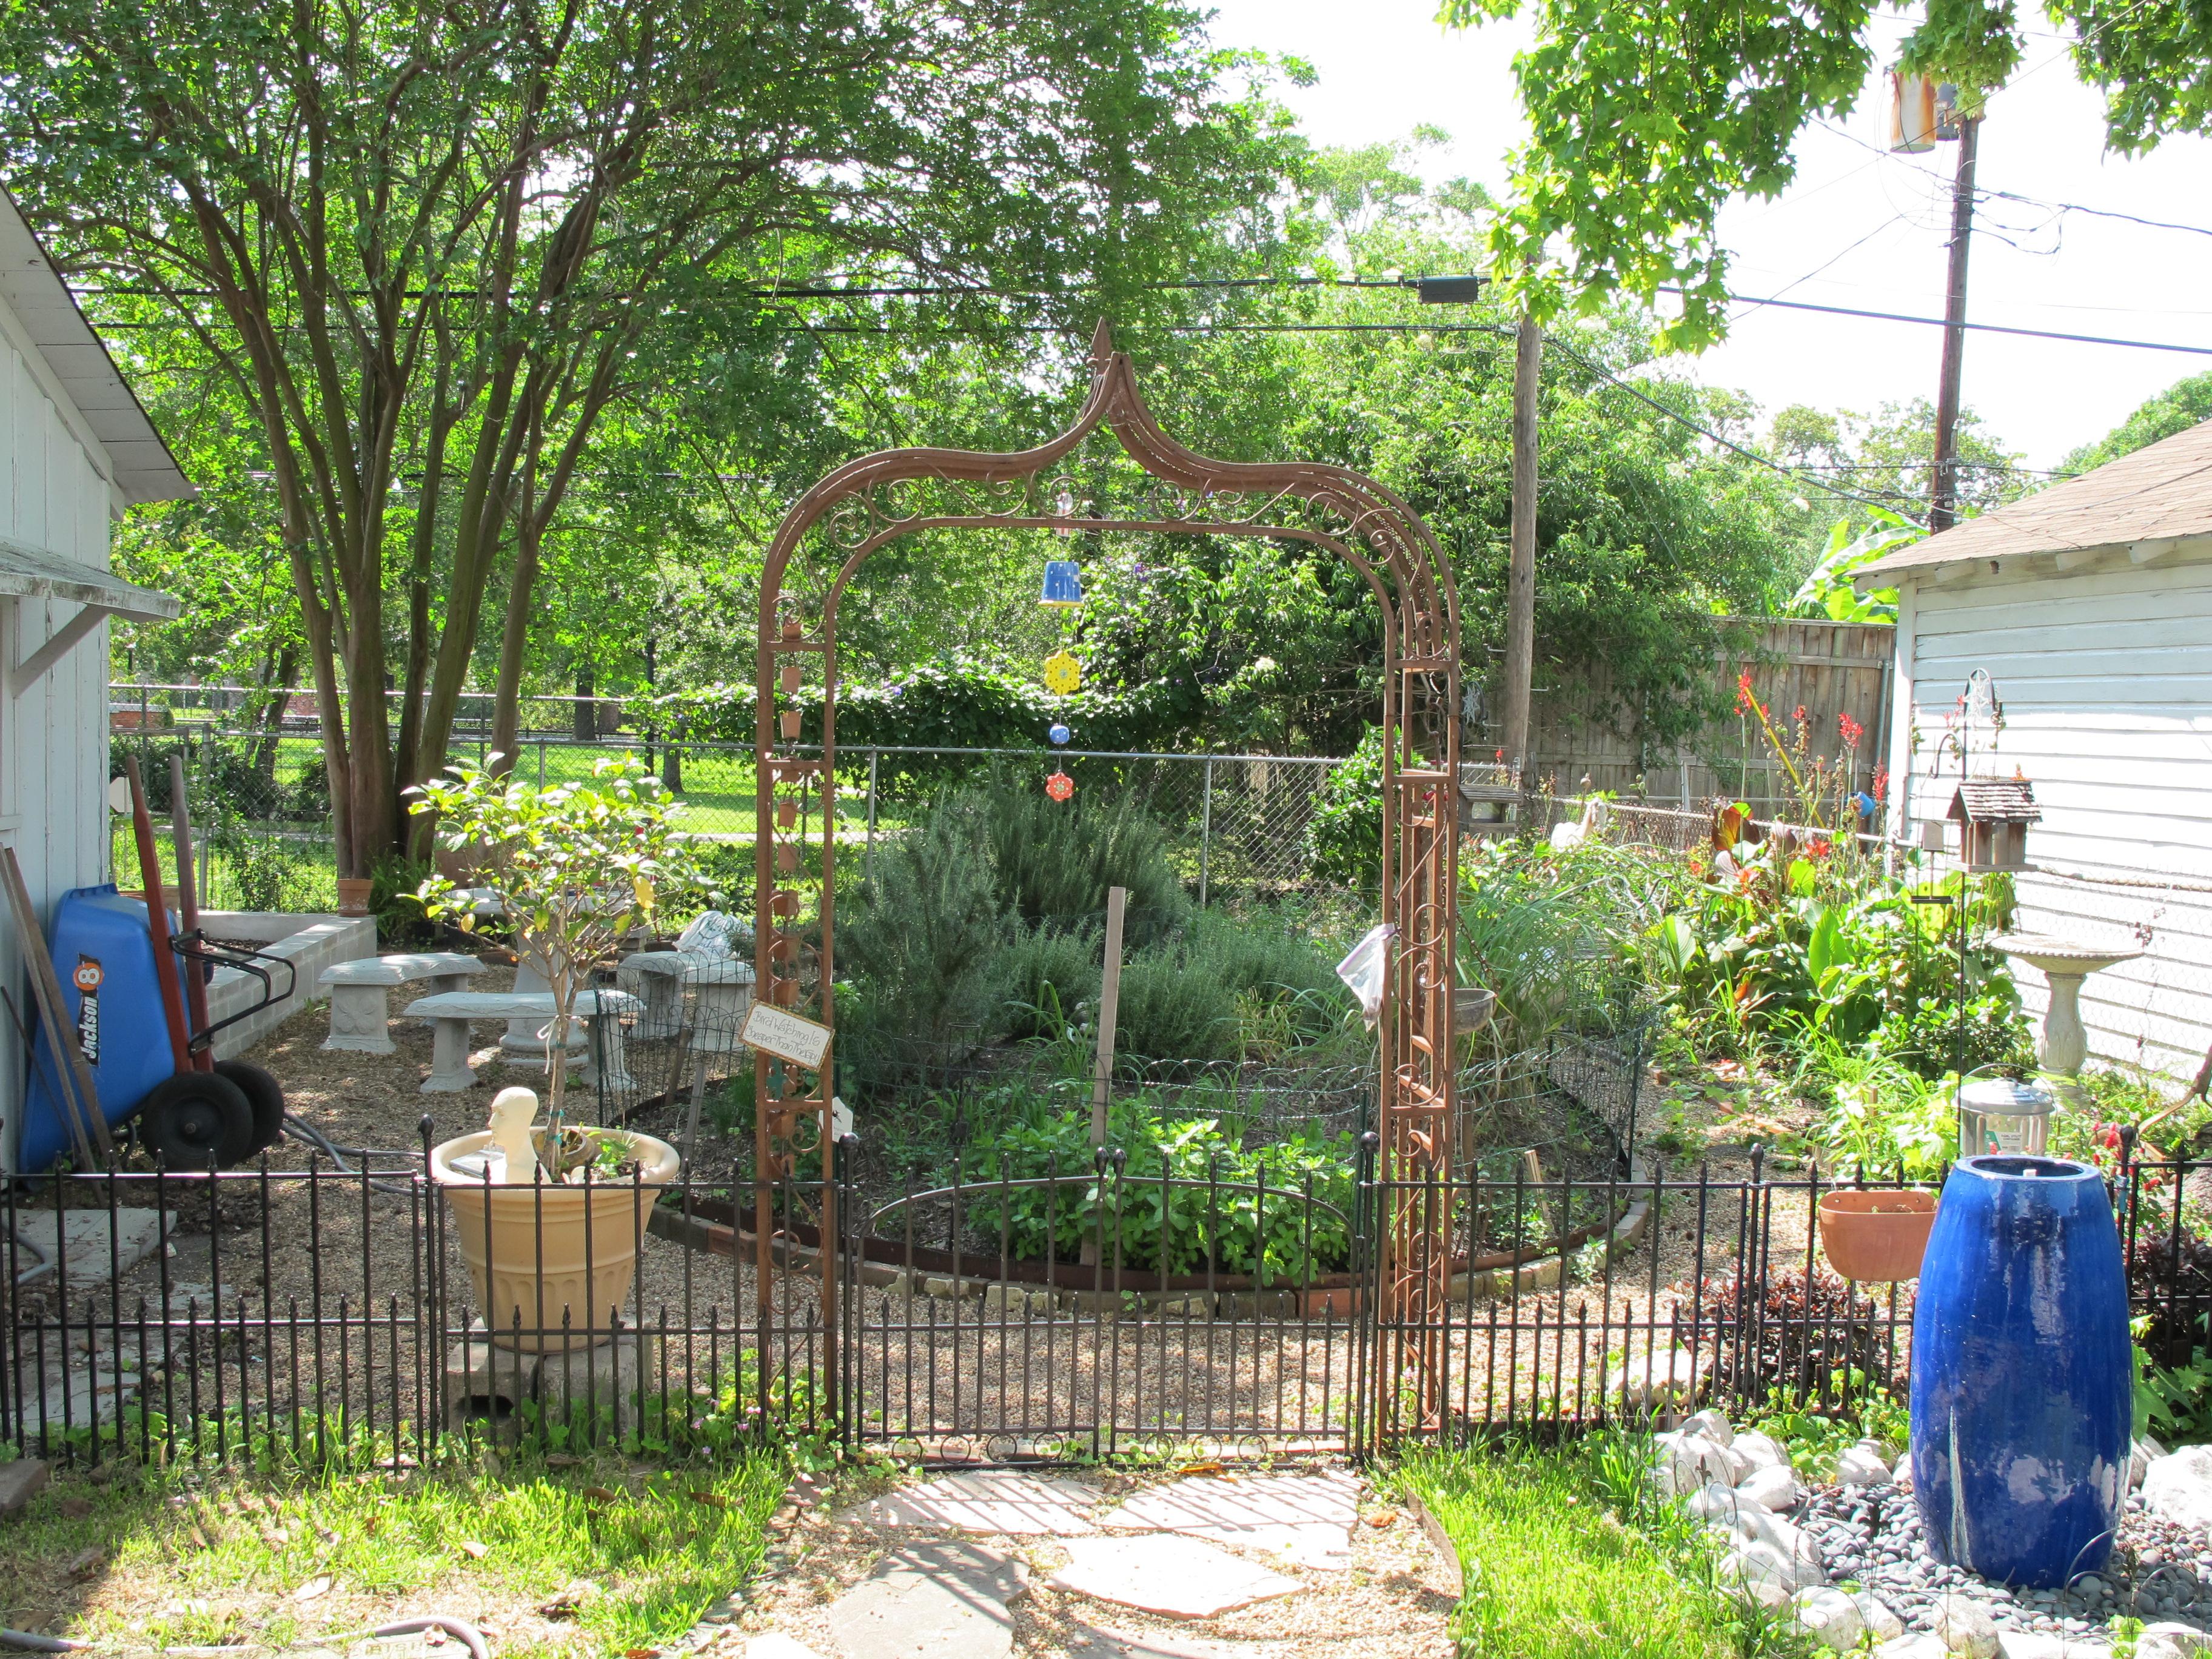 Backyard Herb Garden Design : love to garden My backyard herb garden is an ever changing wonder